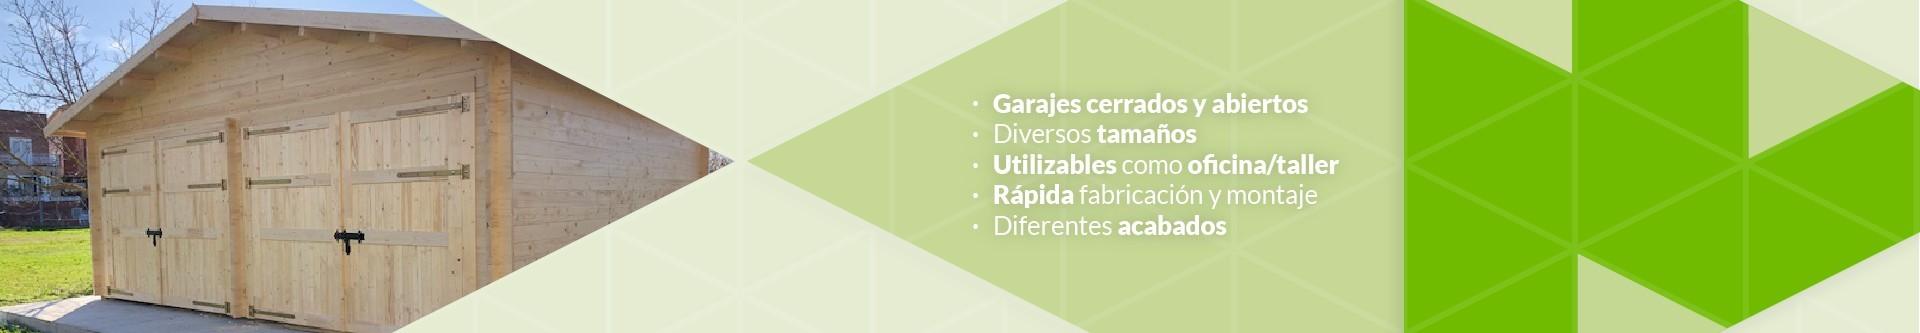 Garajes de madera